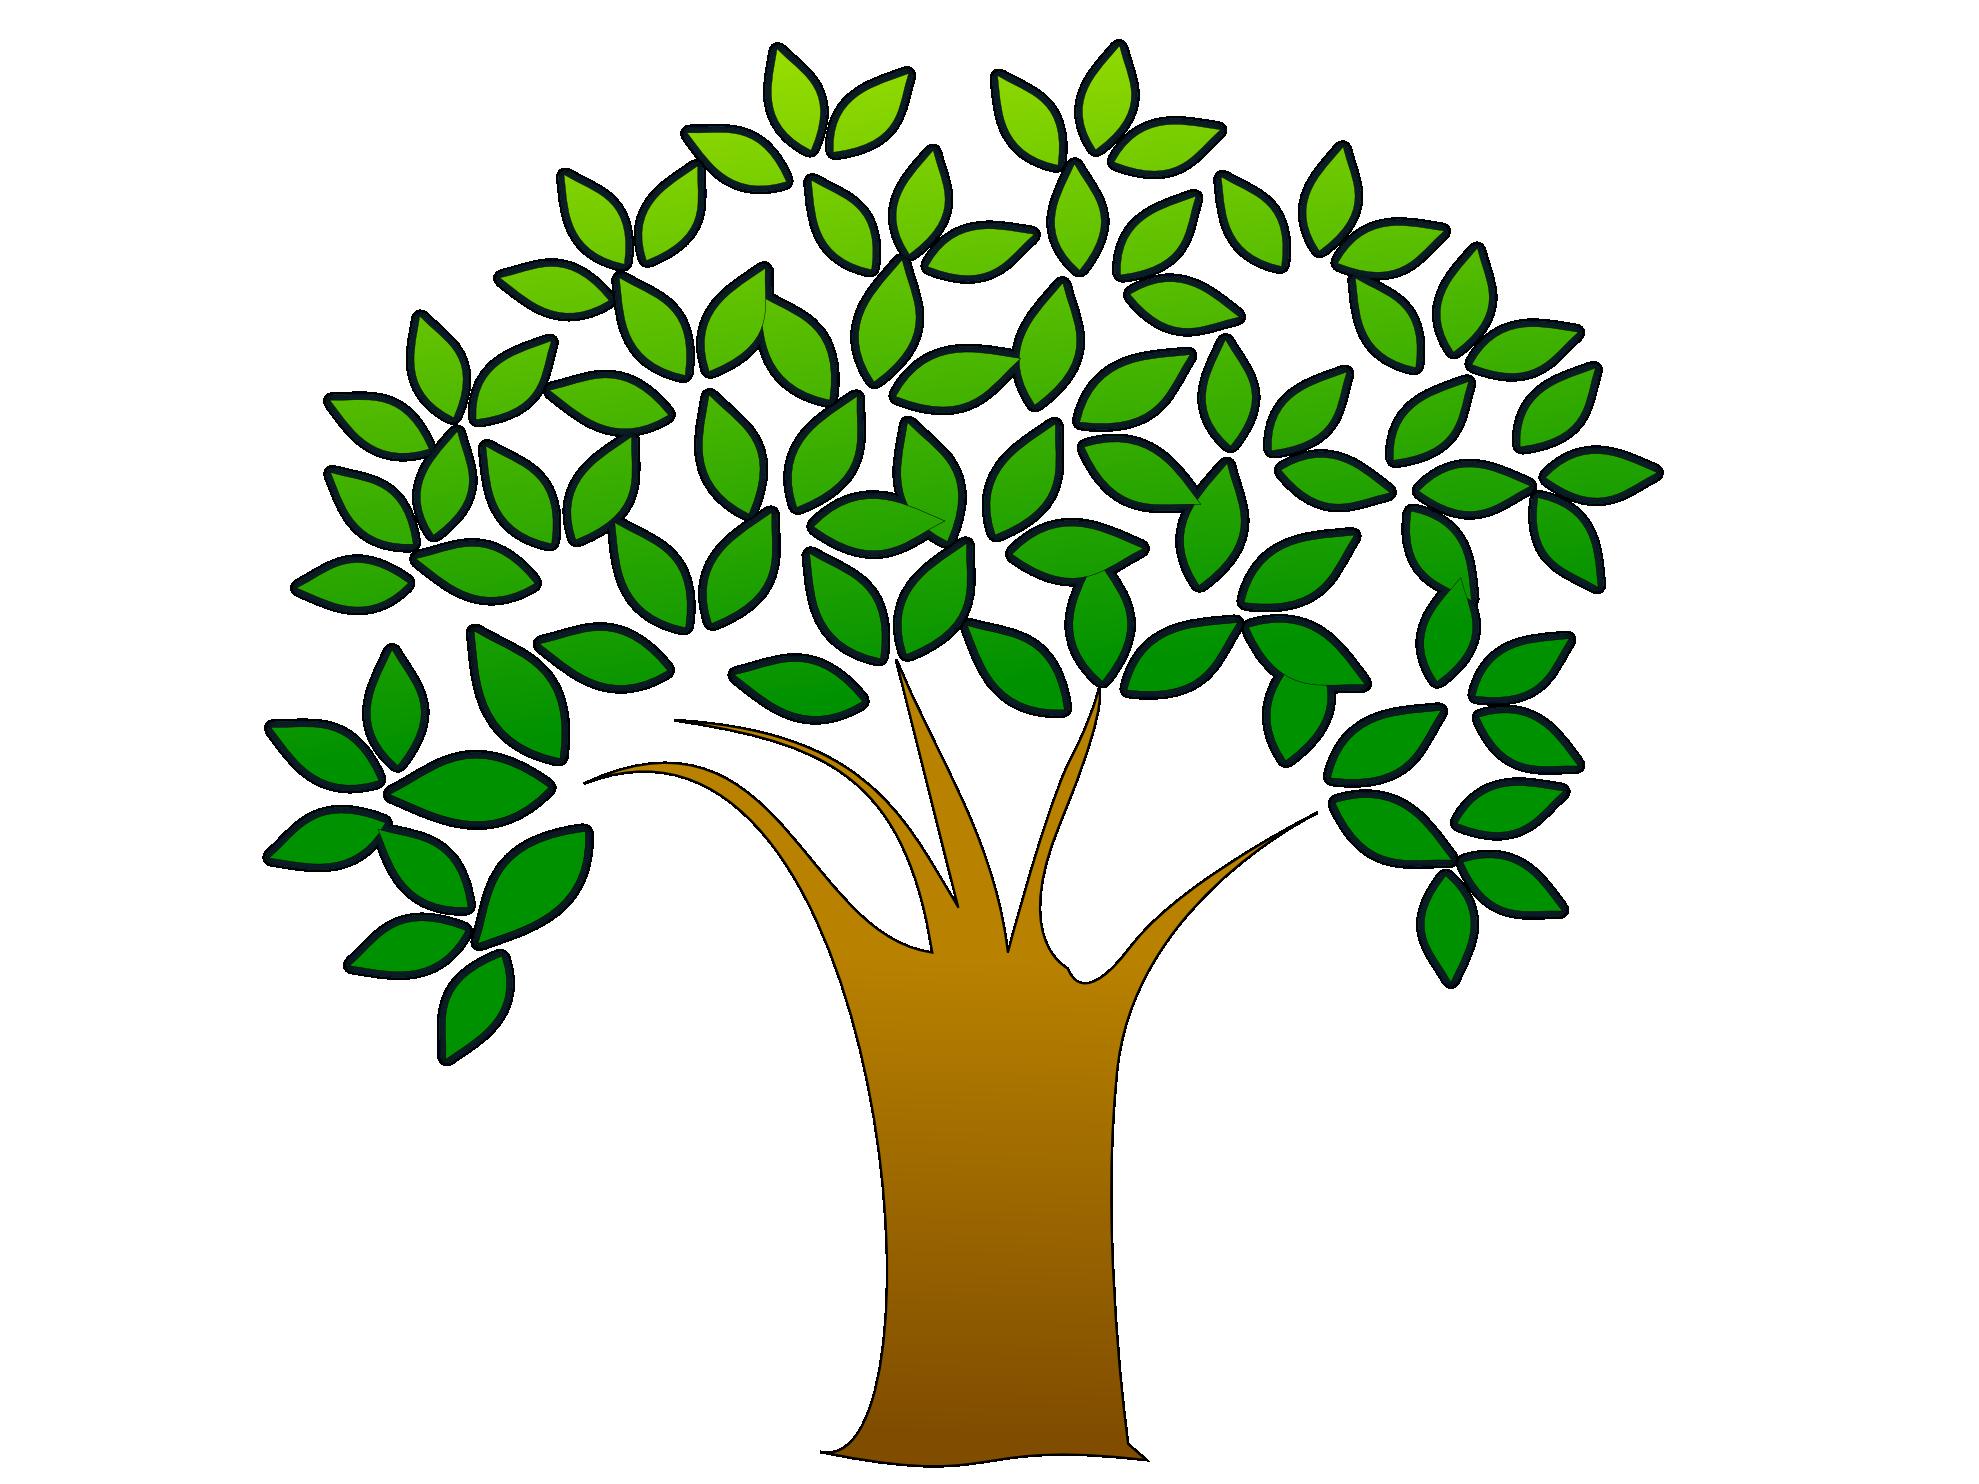 Tree Clip Art 3 - Tree Clipart PNG